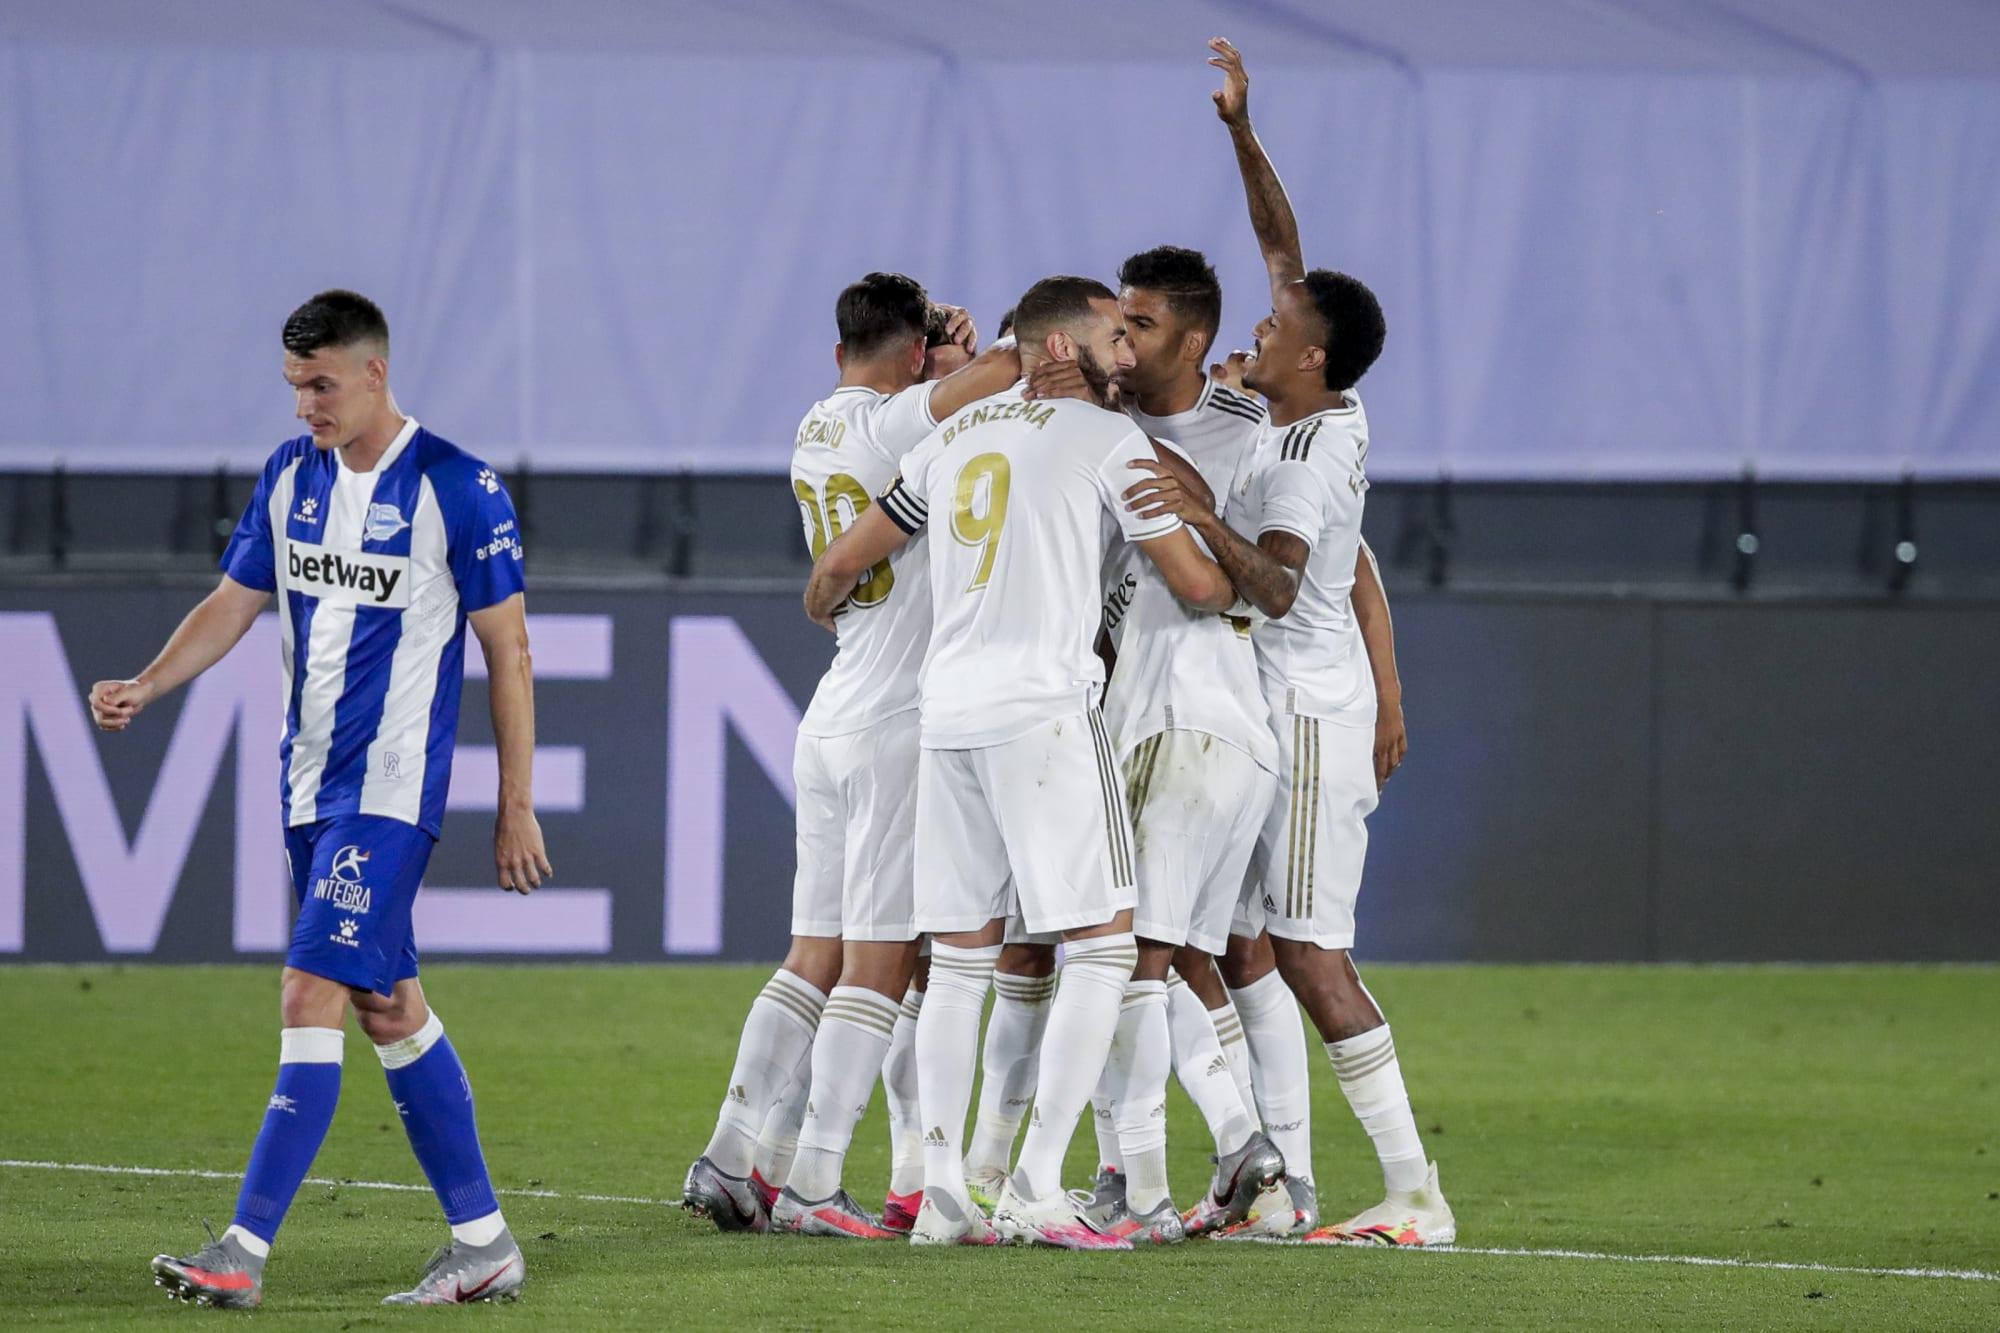 Key highlights as Karim Benzema helps Real Madrid beat Alaves 2-0